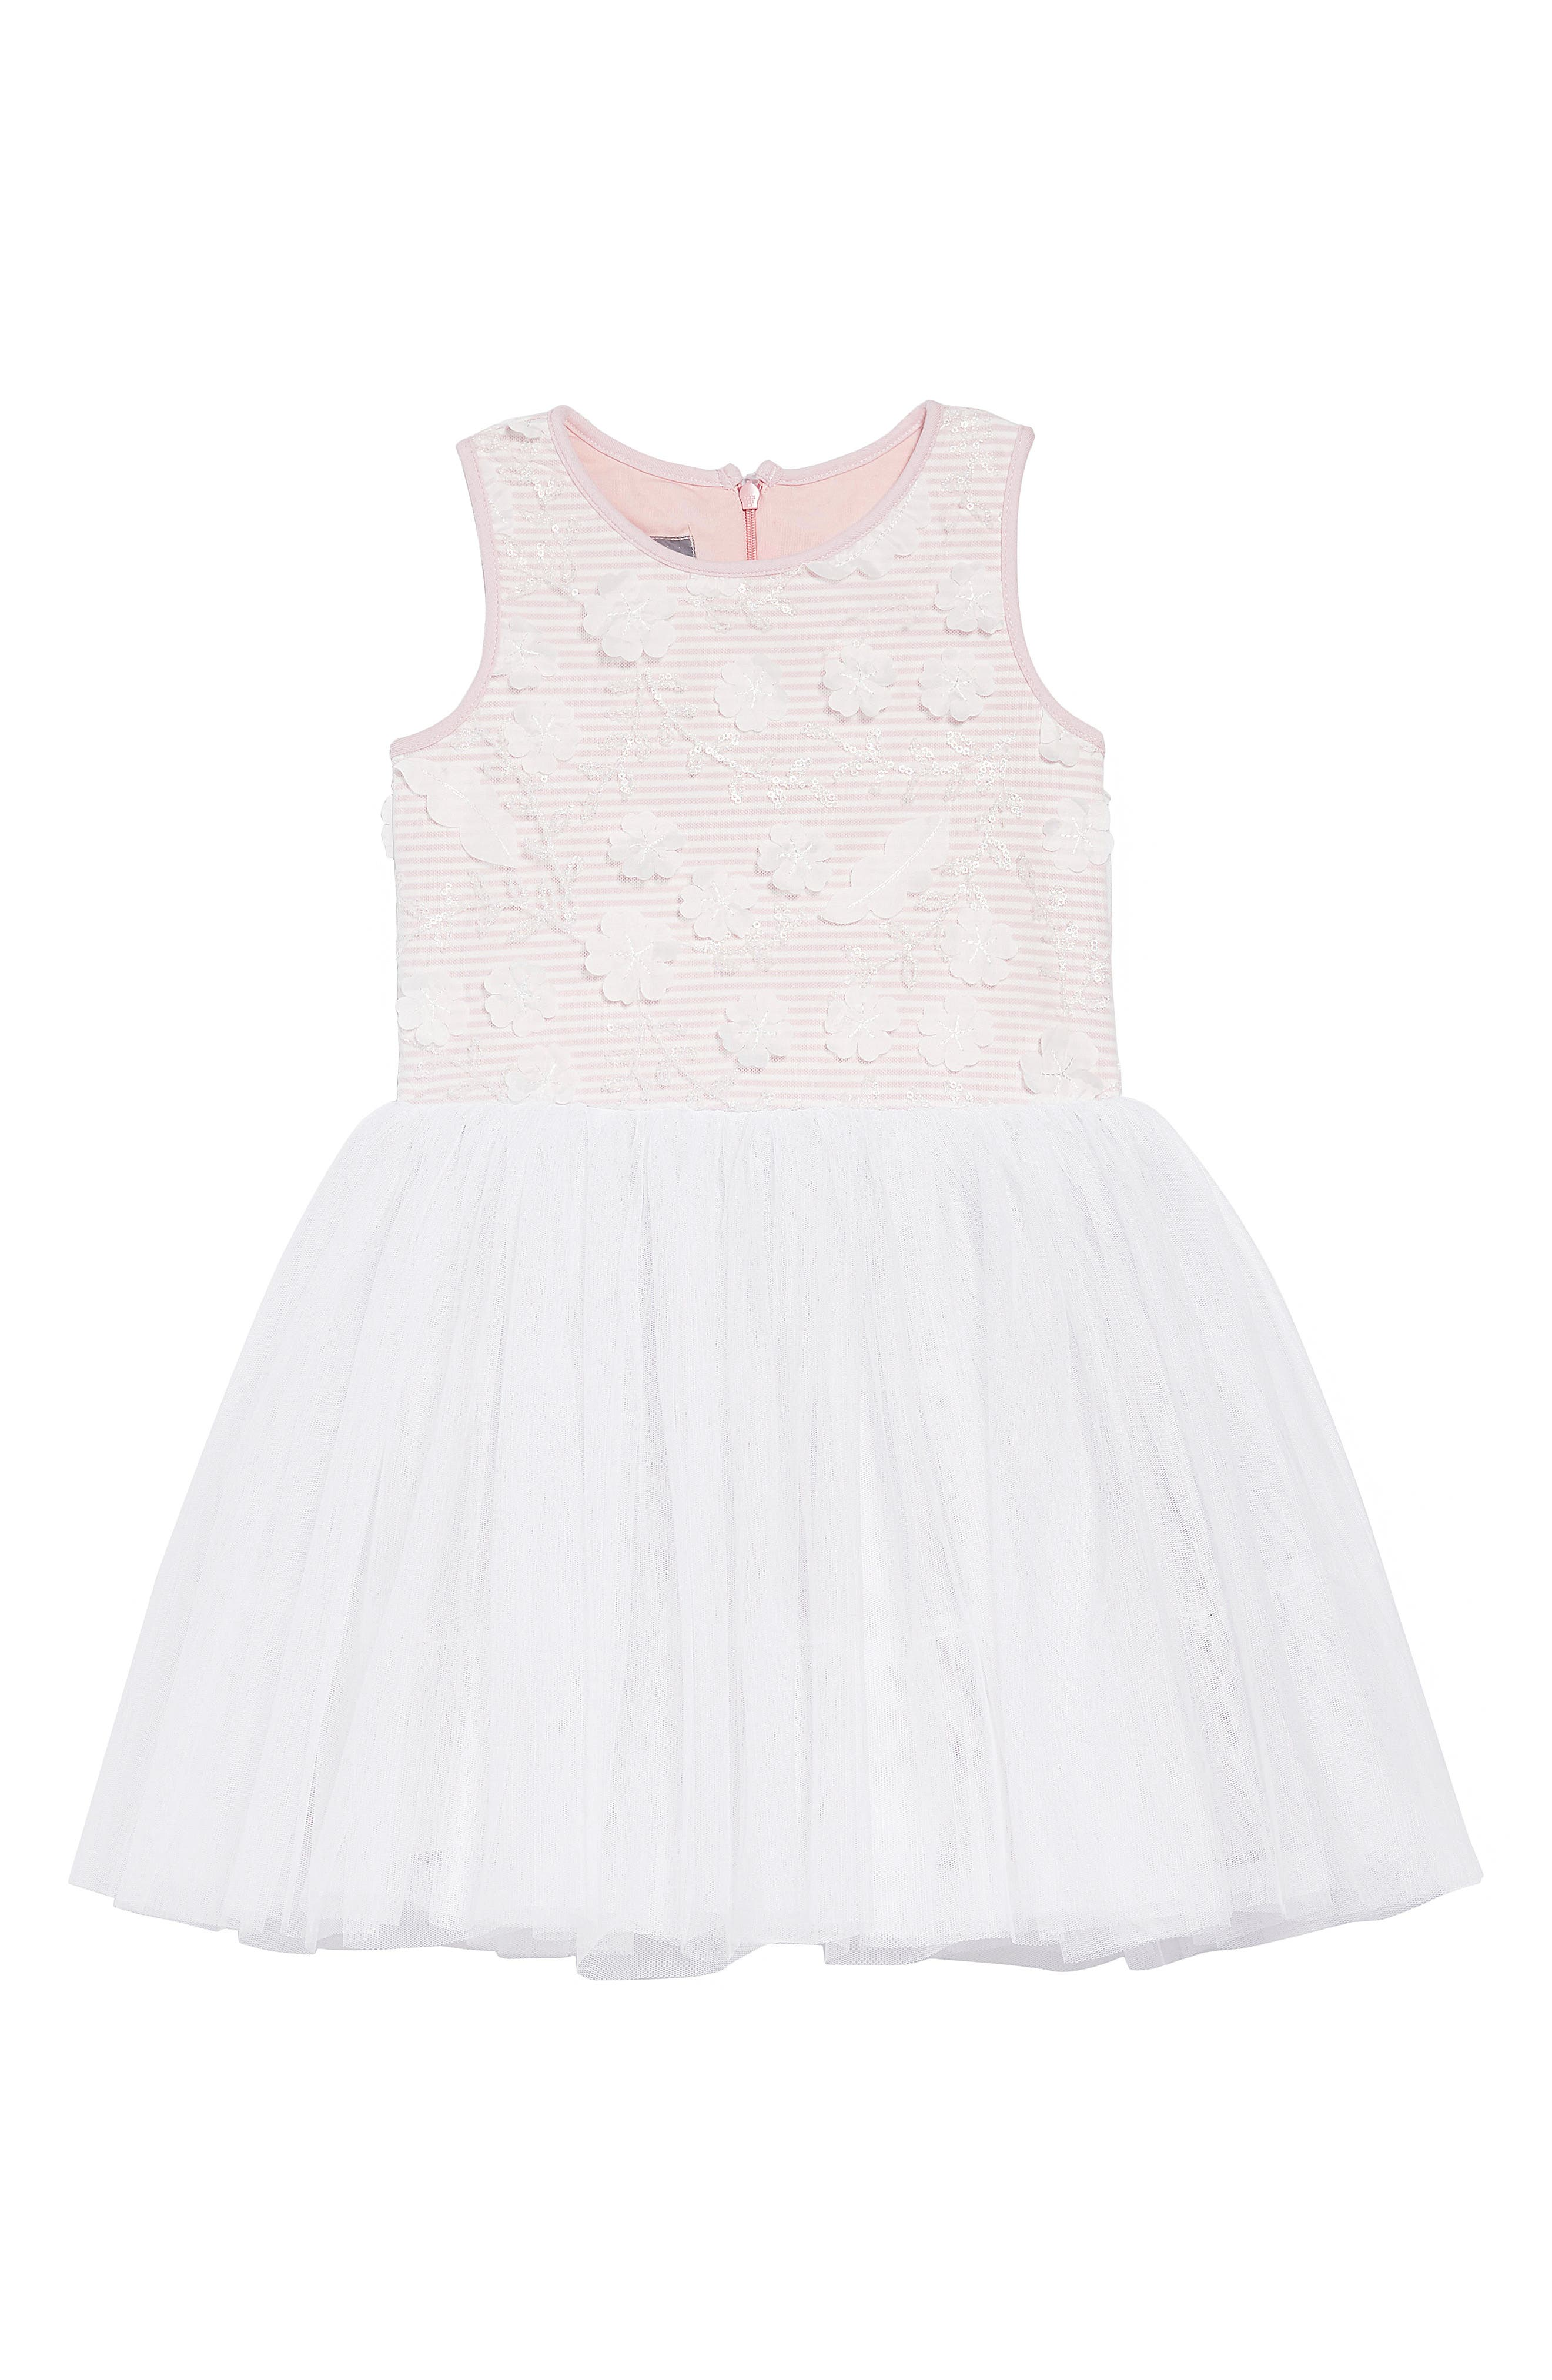 PASTOURELLE BY PIPPA & JULIE, Embellished Bodice Dress, Main thumbnail 1, color, 654